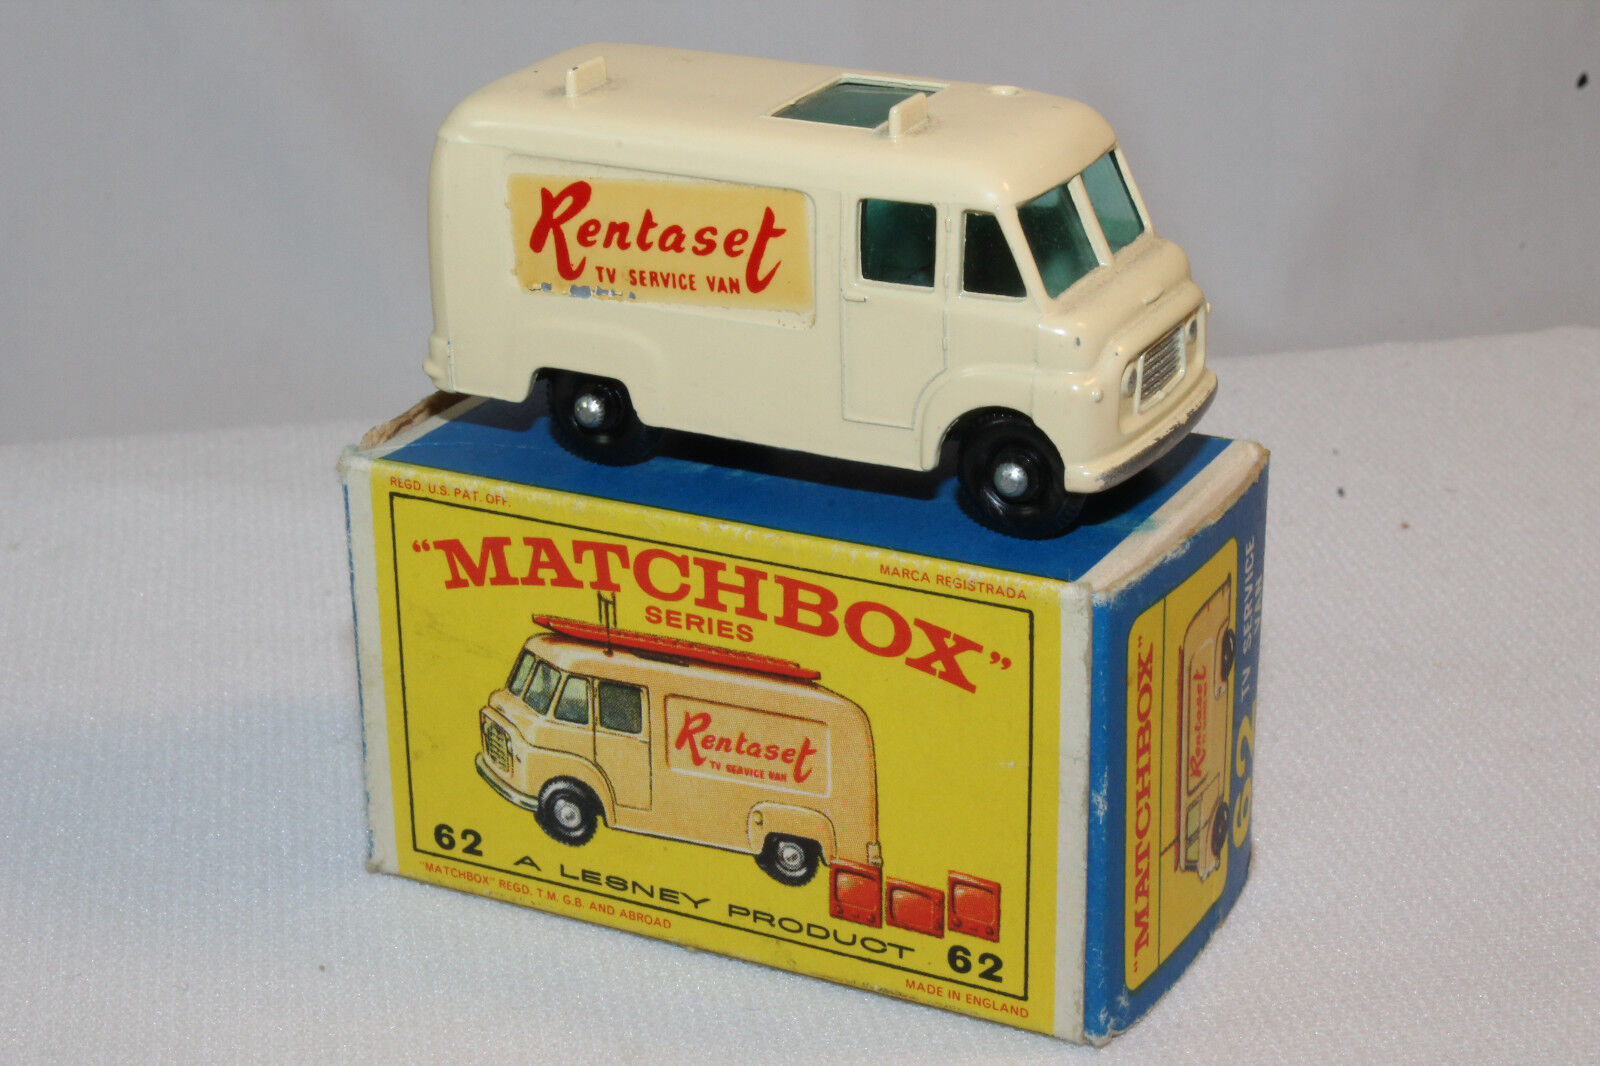 MATCHBOX  62B COMMER TV SERVICE VAN, RENTASET, OUTSTANDING, BOXED TYPE E